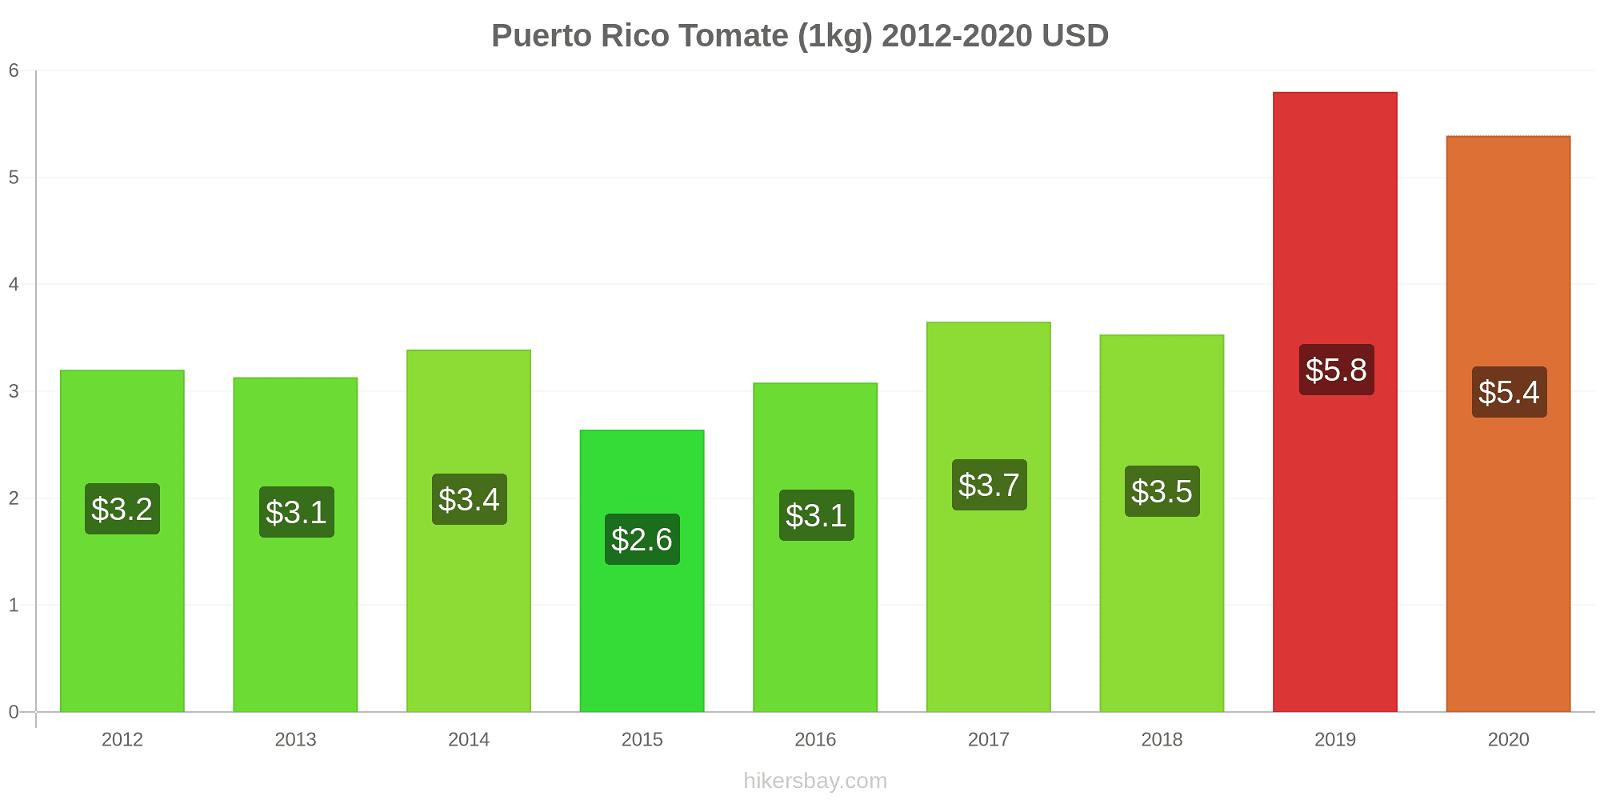 Puerto Rico modificări de preț Tomate (1kg) hikersbay.com